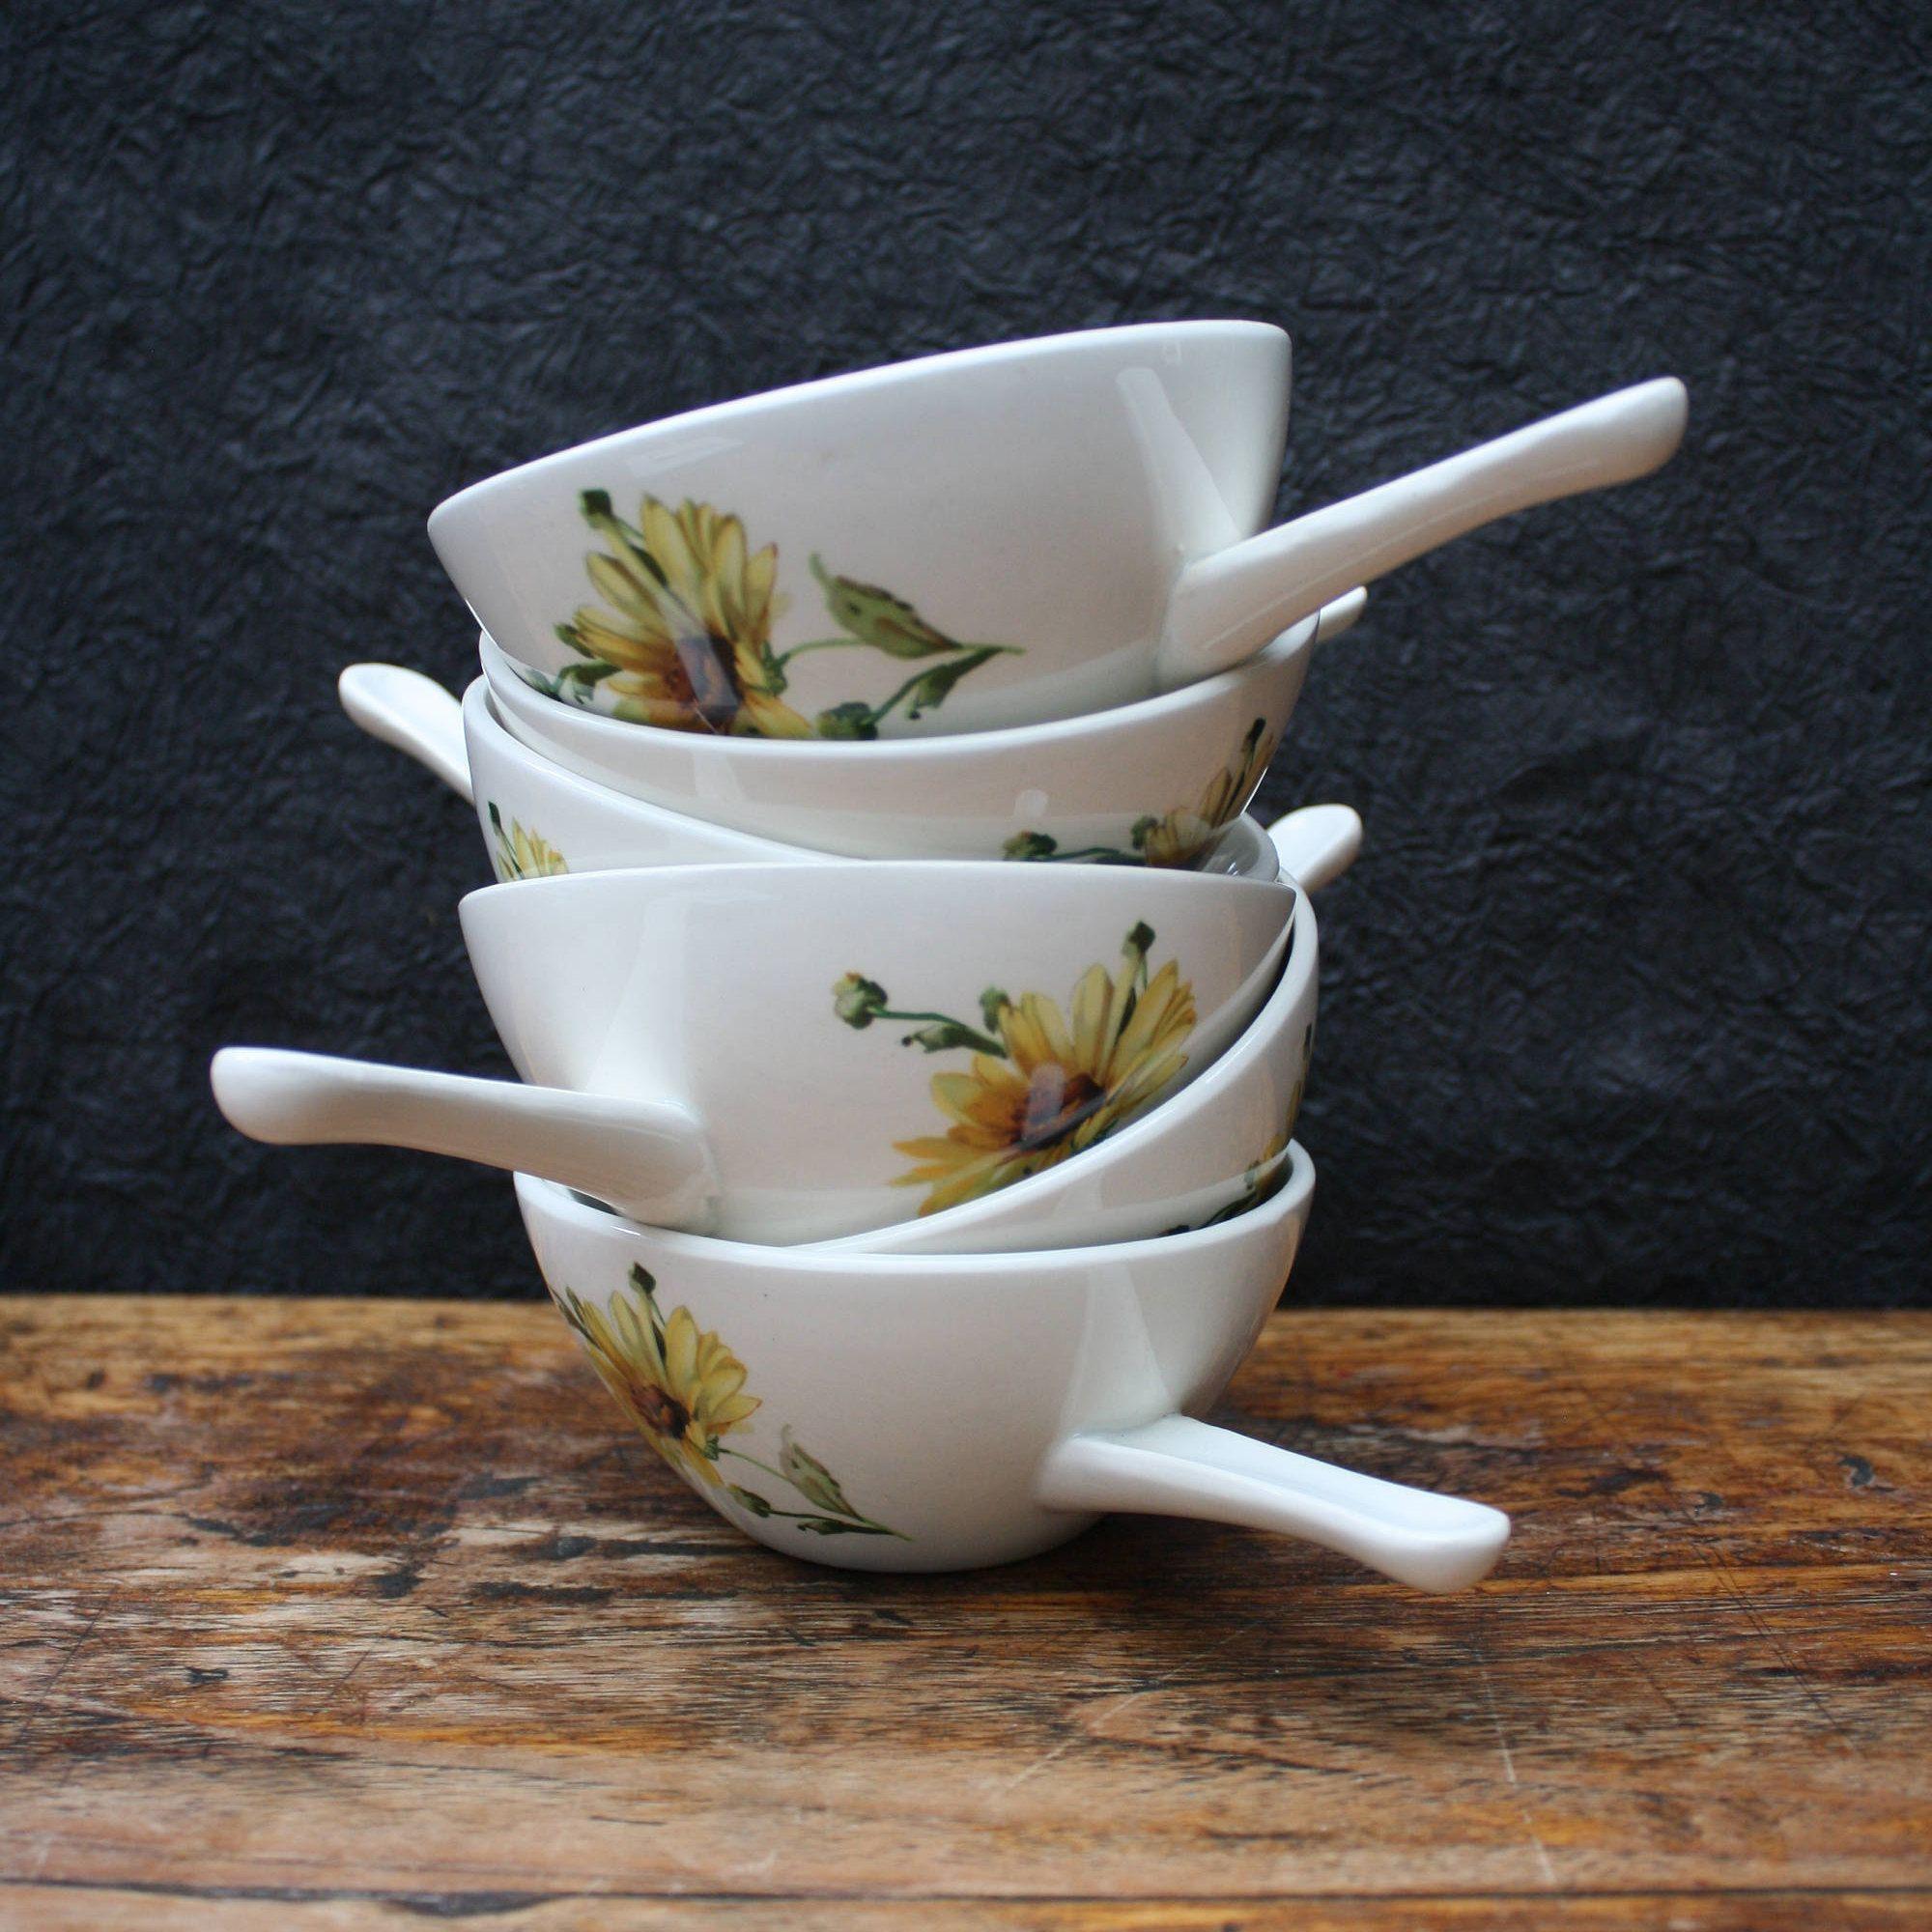 Boch Belgium, retro soup bowls with handles, vintage bowls, retro ...